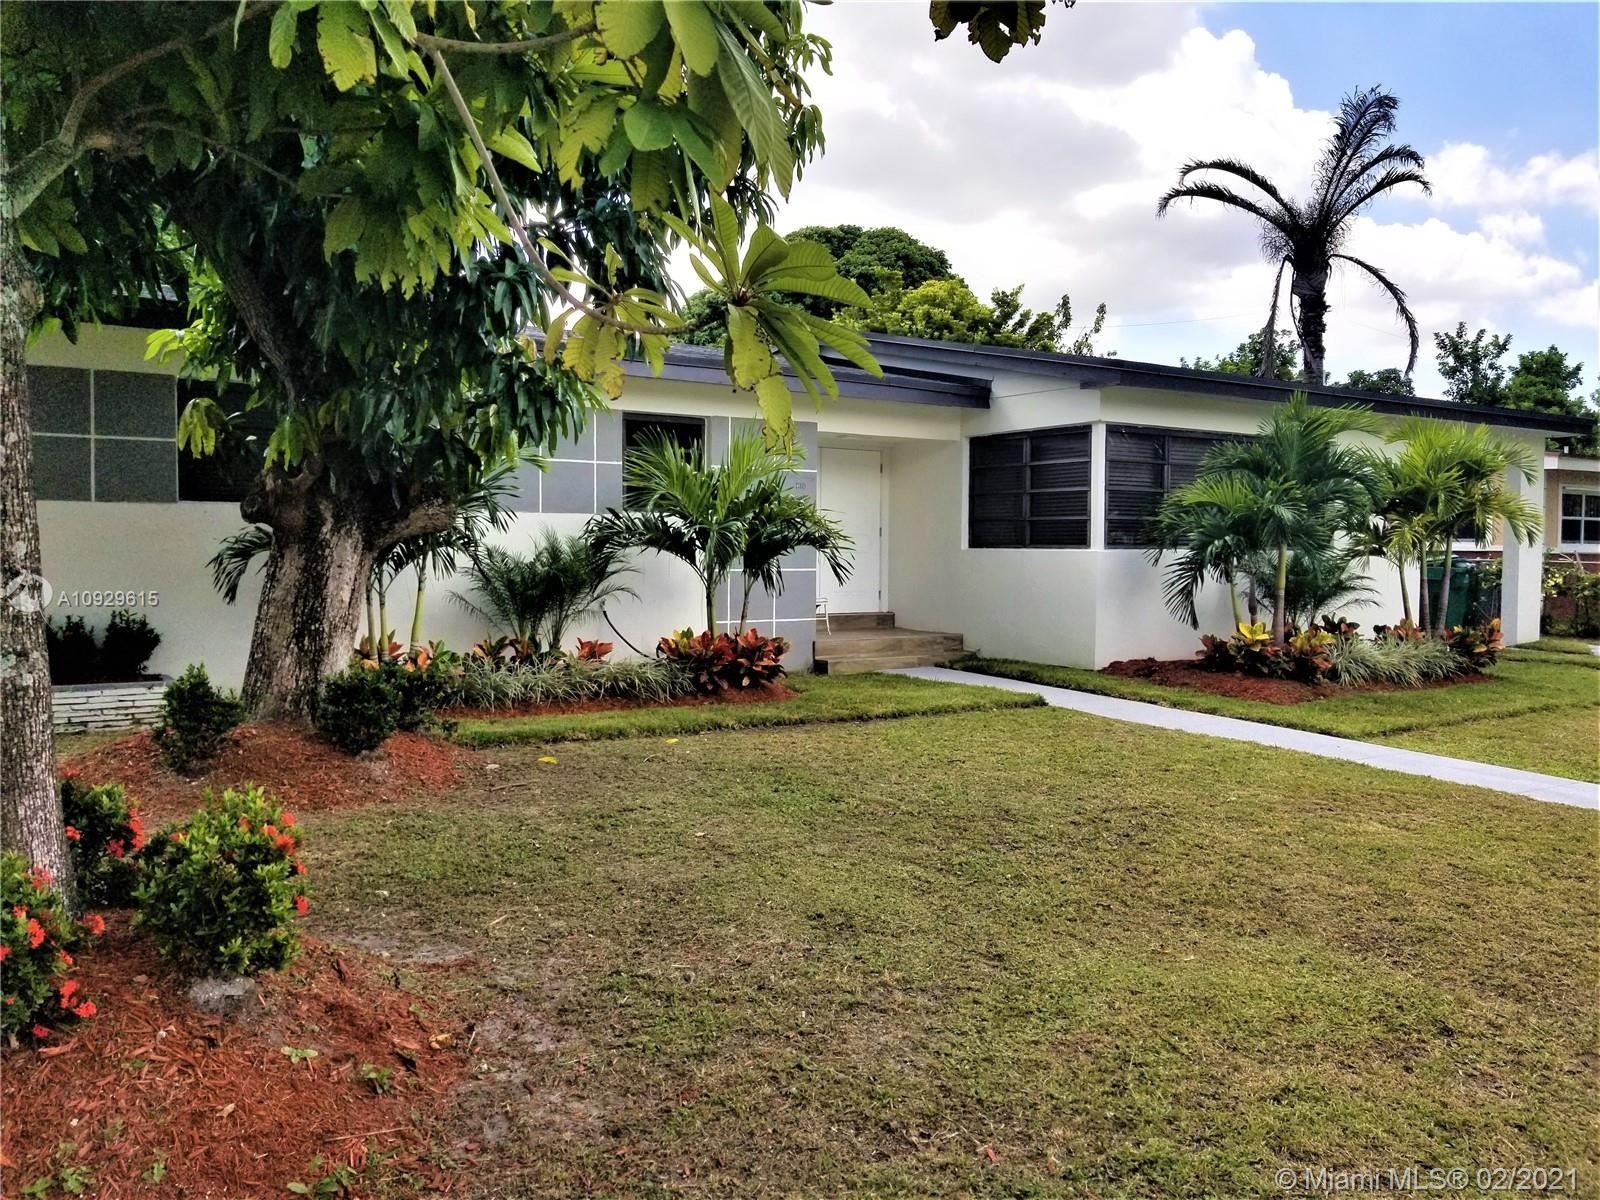 1110 NW 186th St, Miami Gardens, FL 33169 - #: A10929615